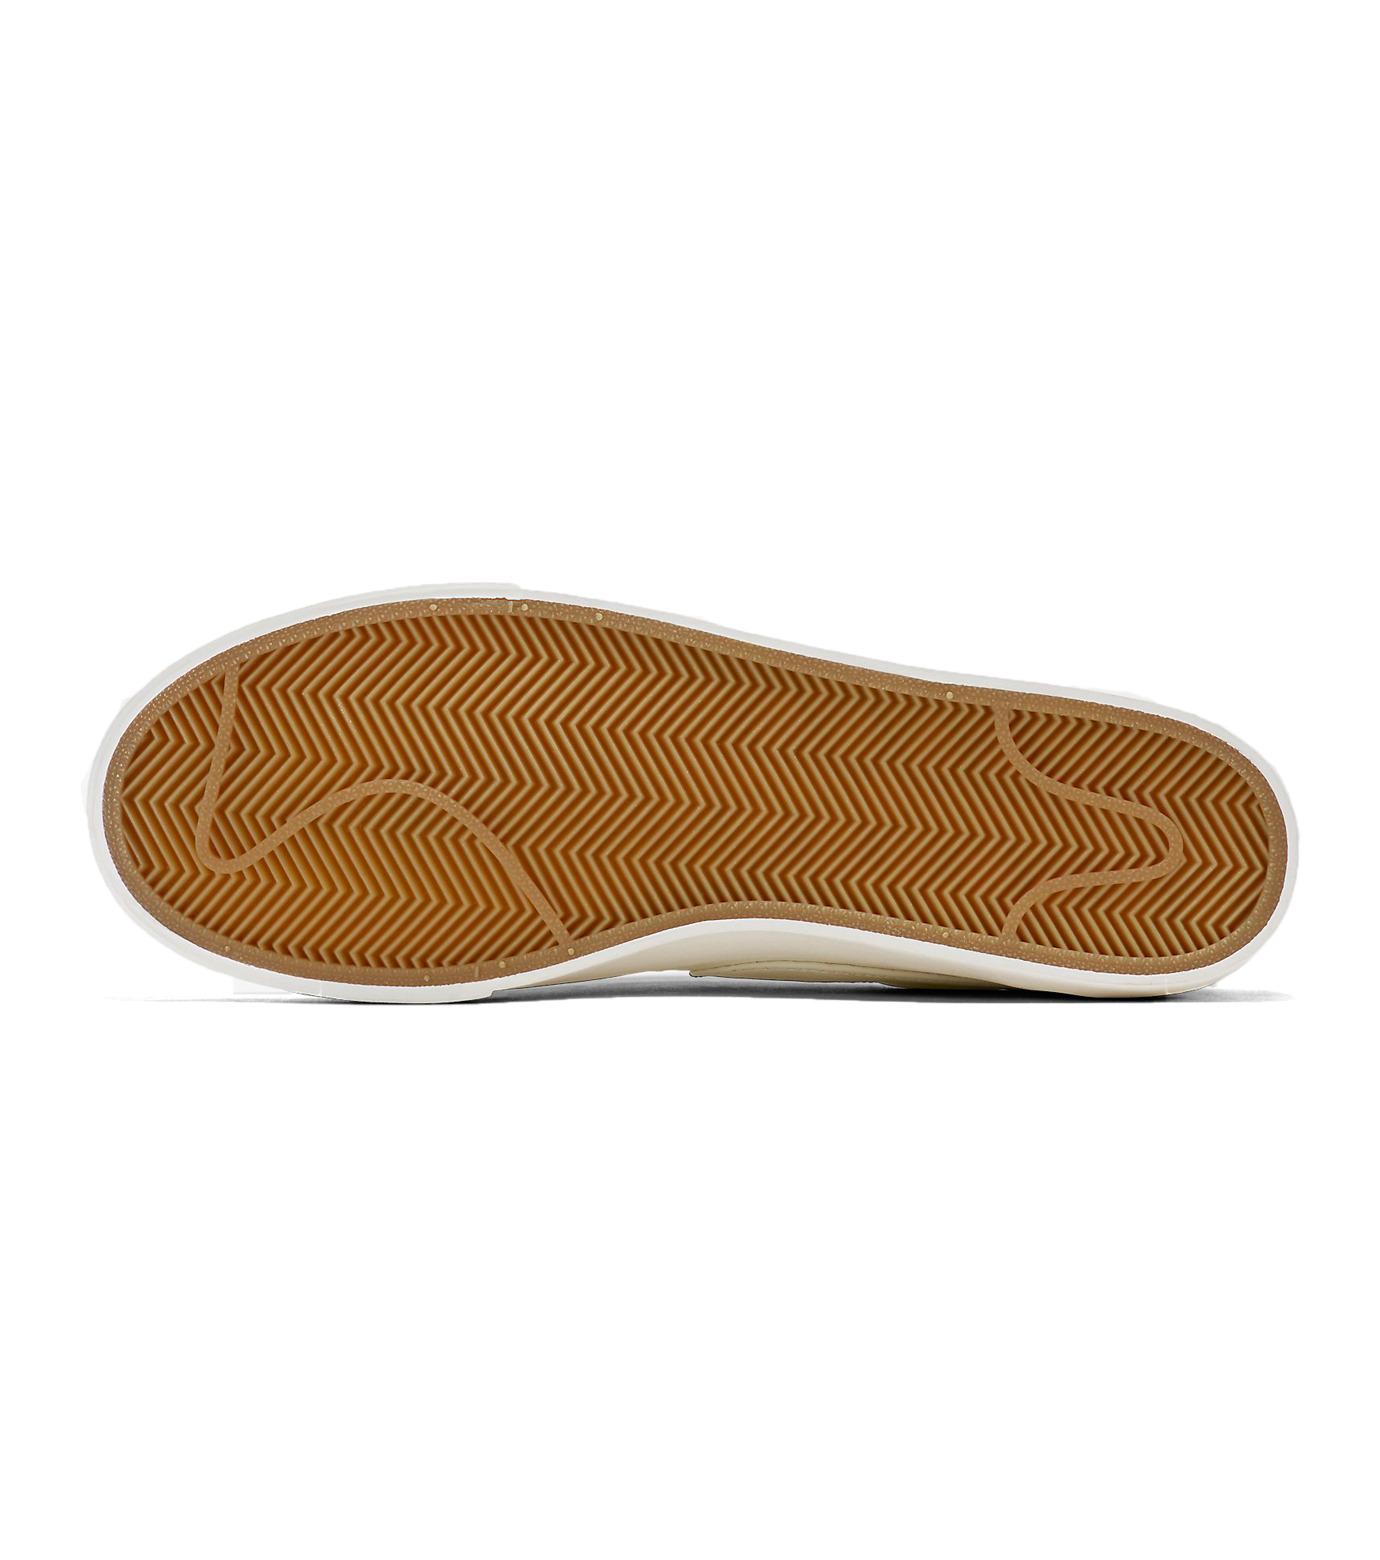 NIKE(ナイキ)のBLAZER STUDIO LOW-WHITE(シューズ/shoes)-904804-100-4 拡大詳細画像2